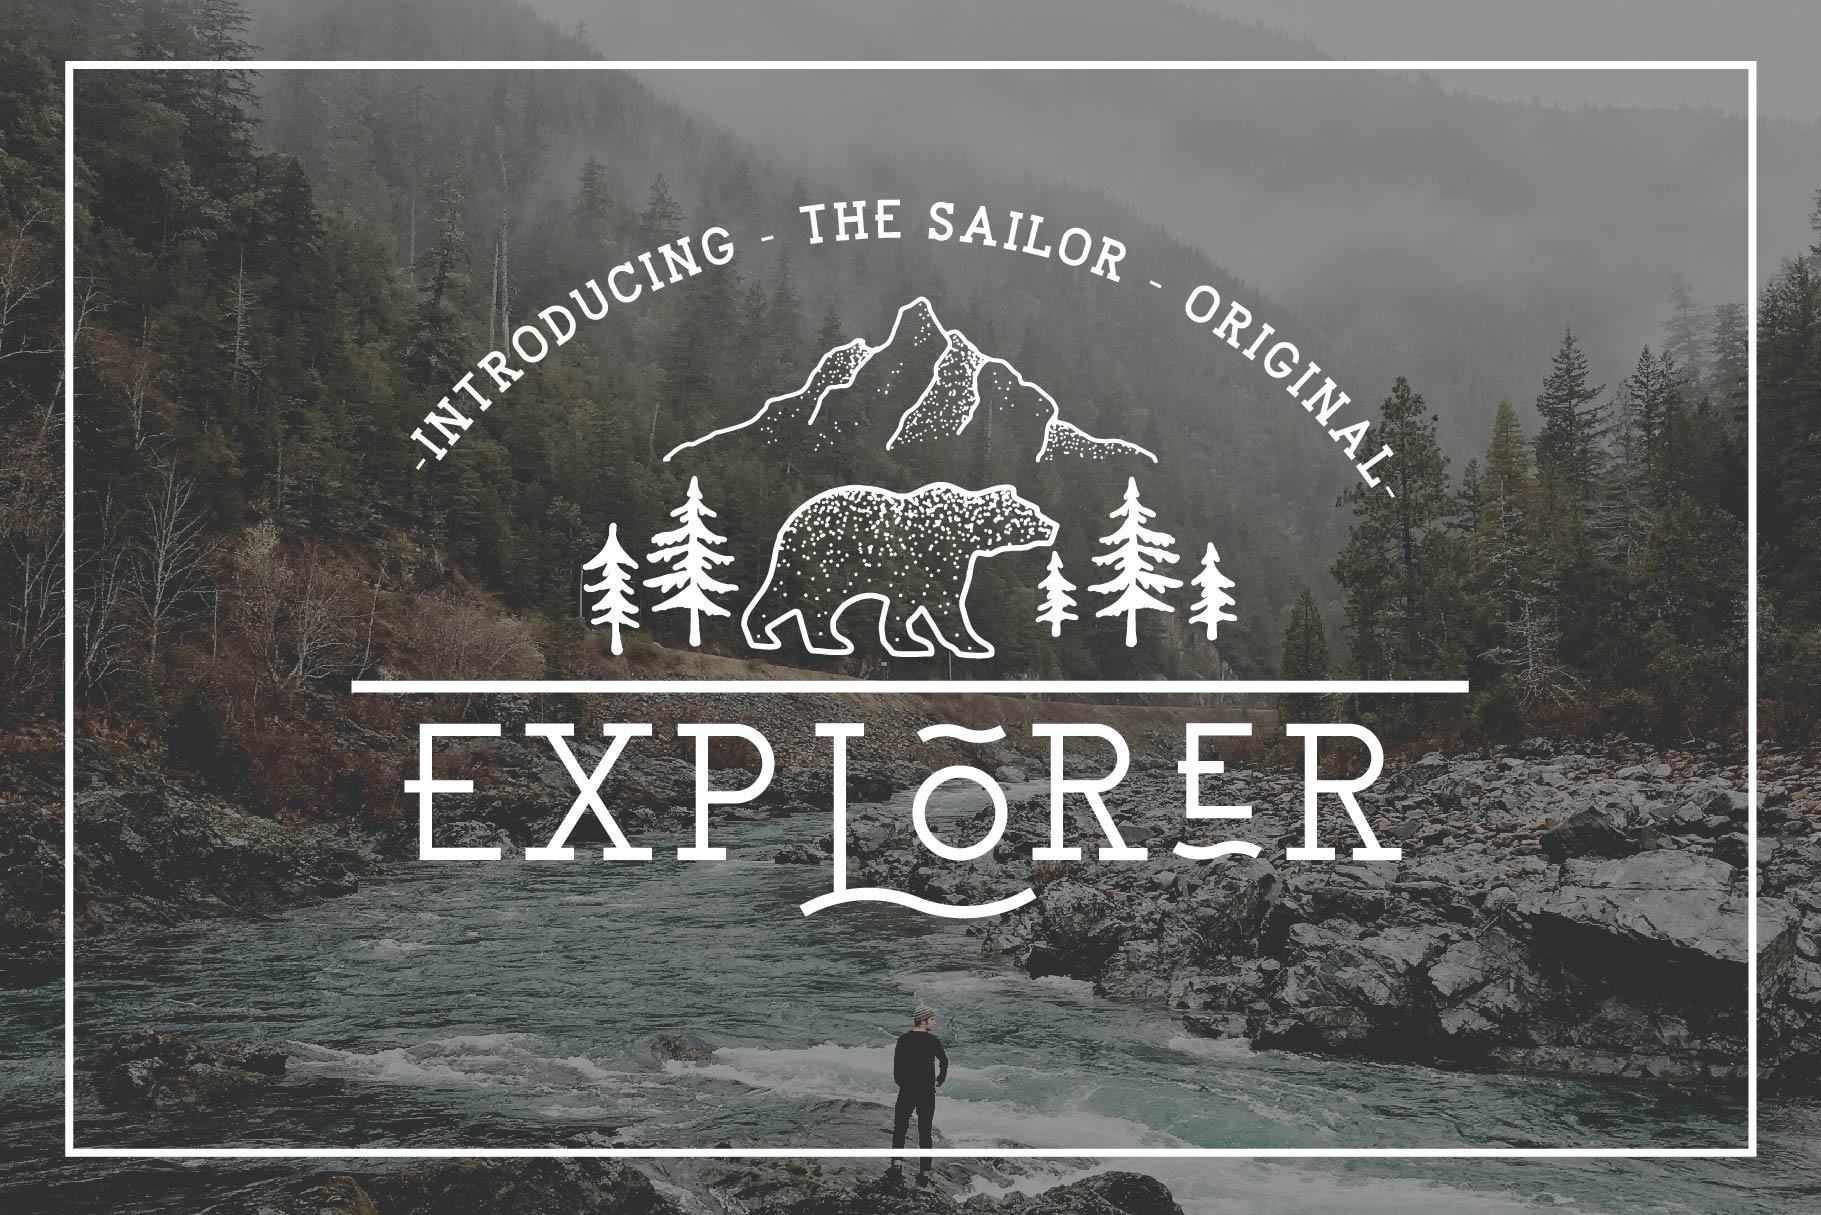 EXPLORER - Sailor Original Typeface example image 10